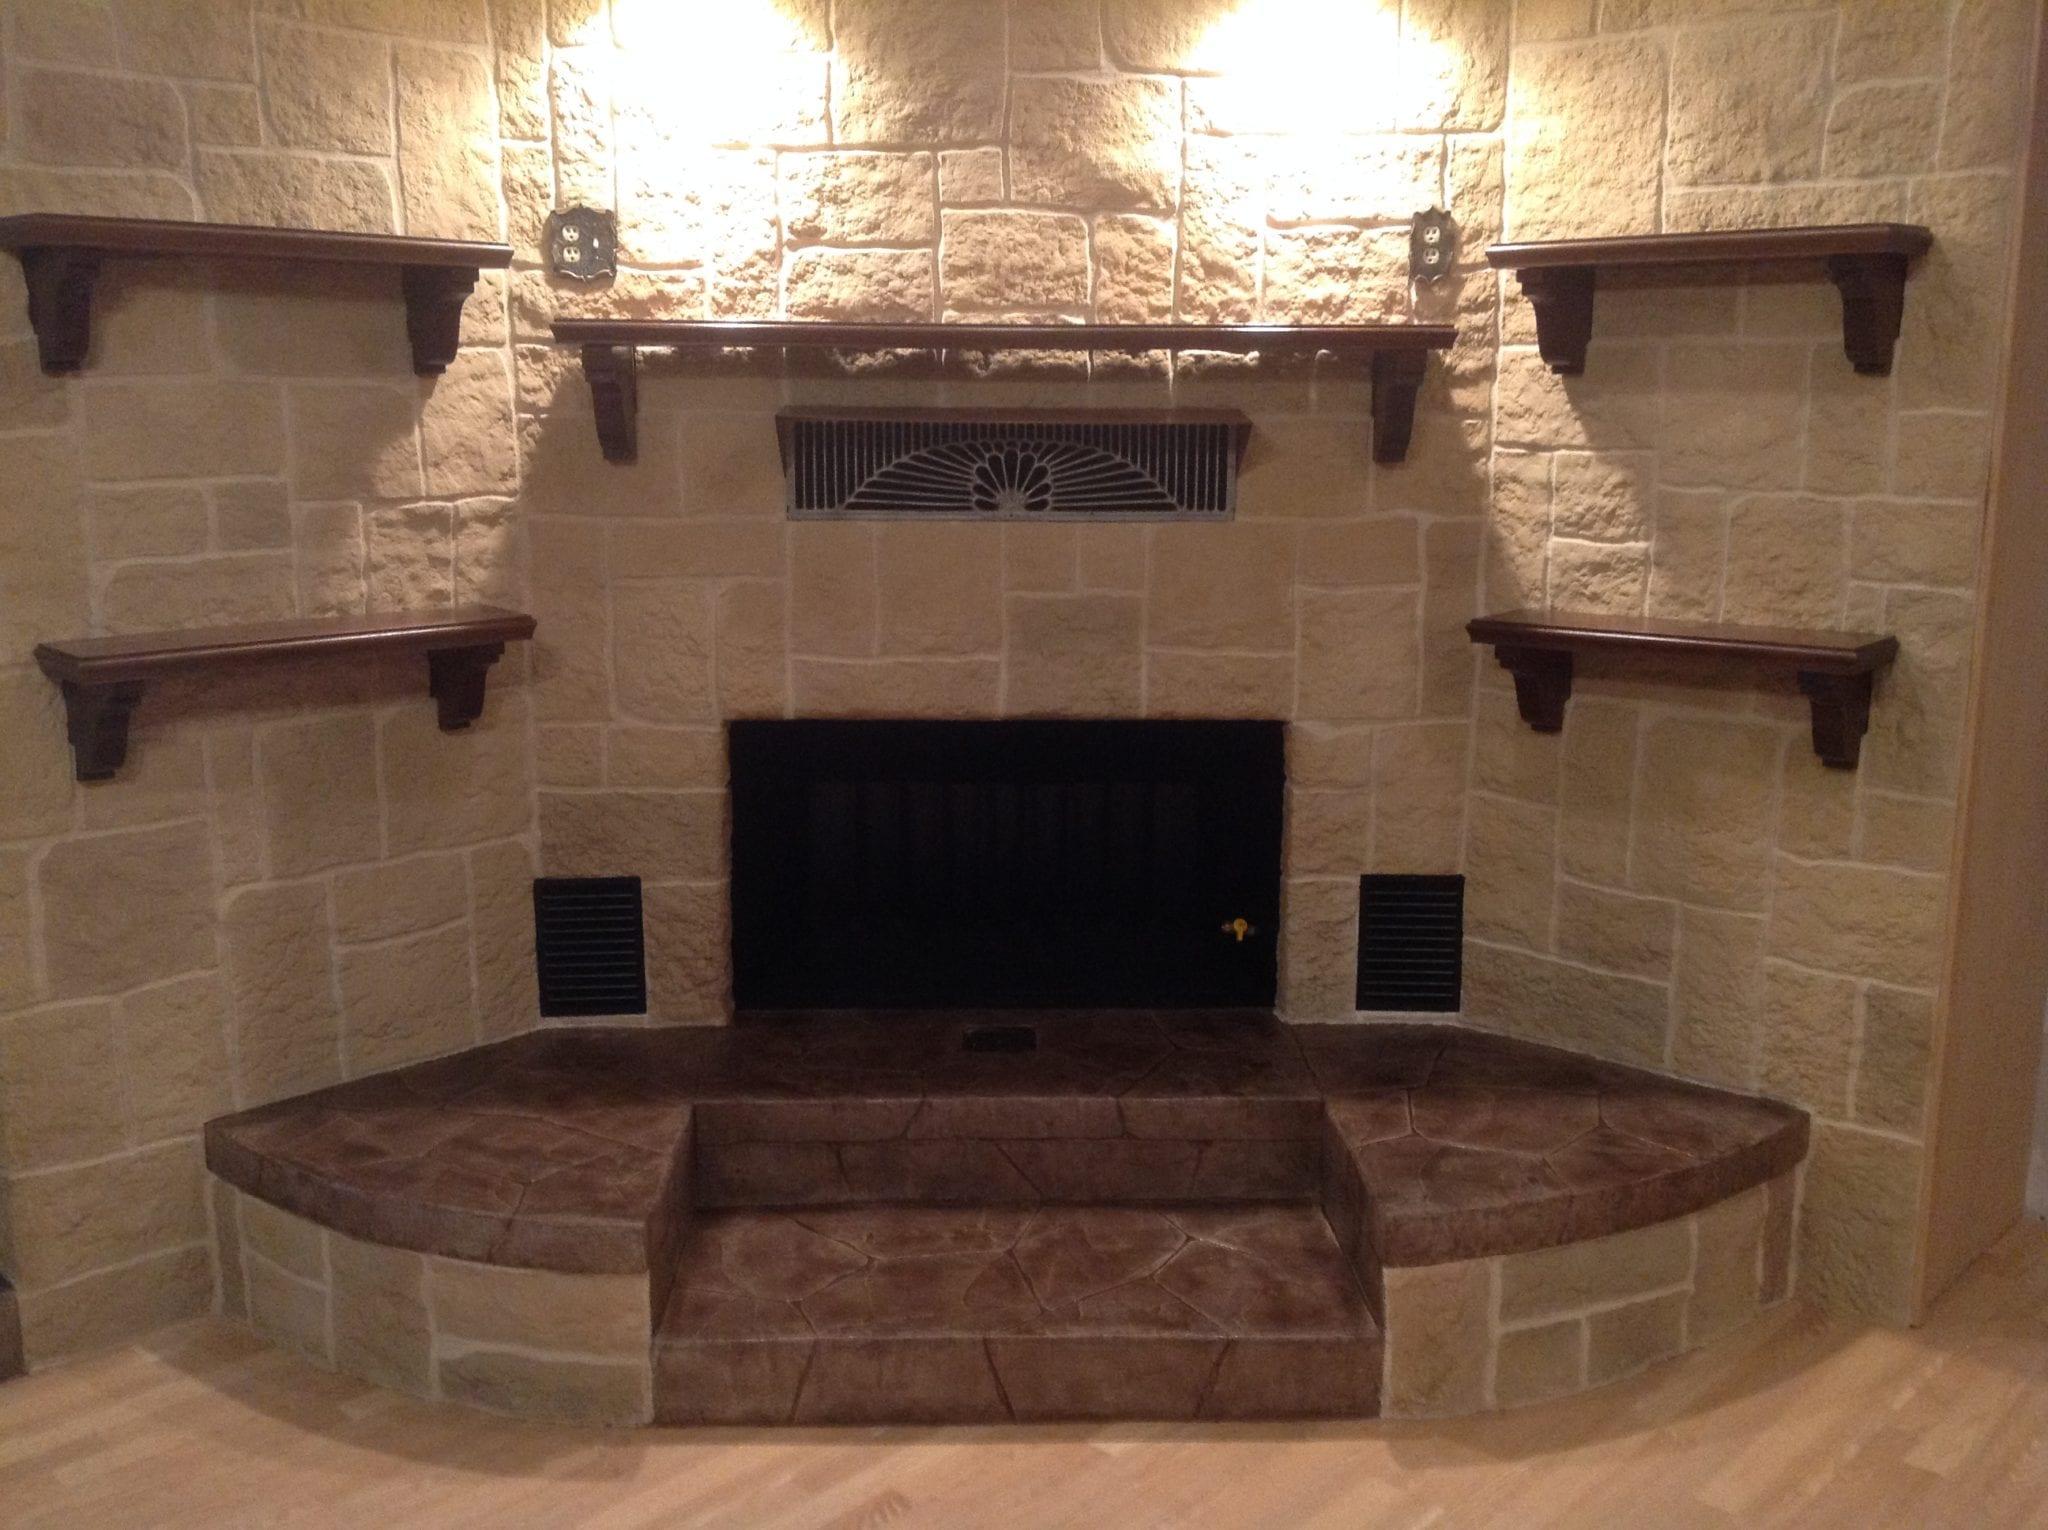 Brick Fireplace After